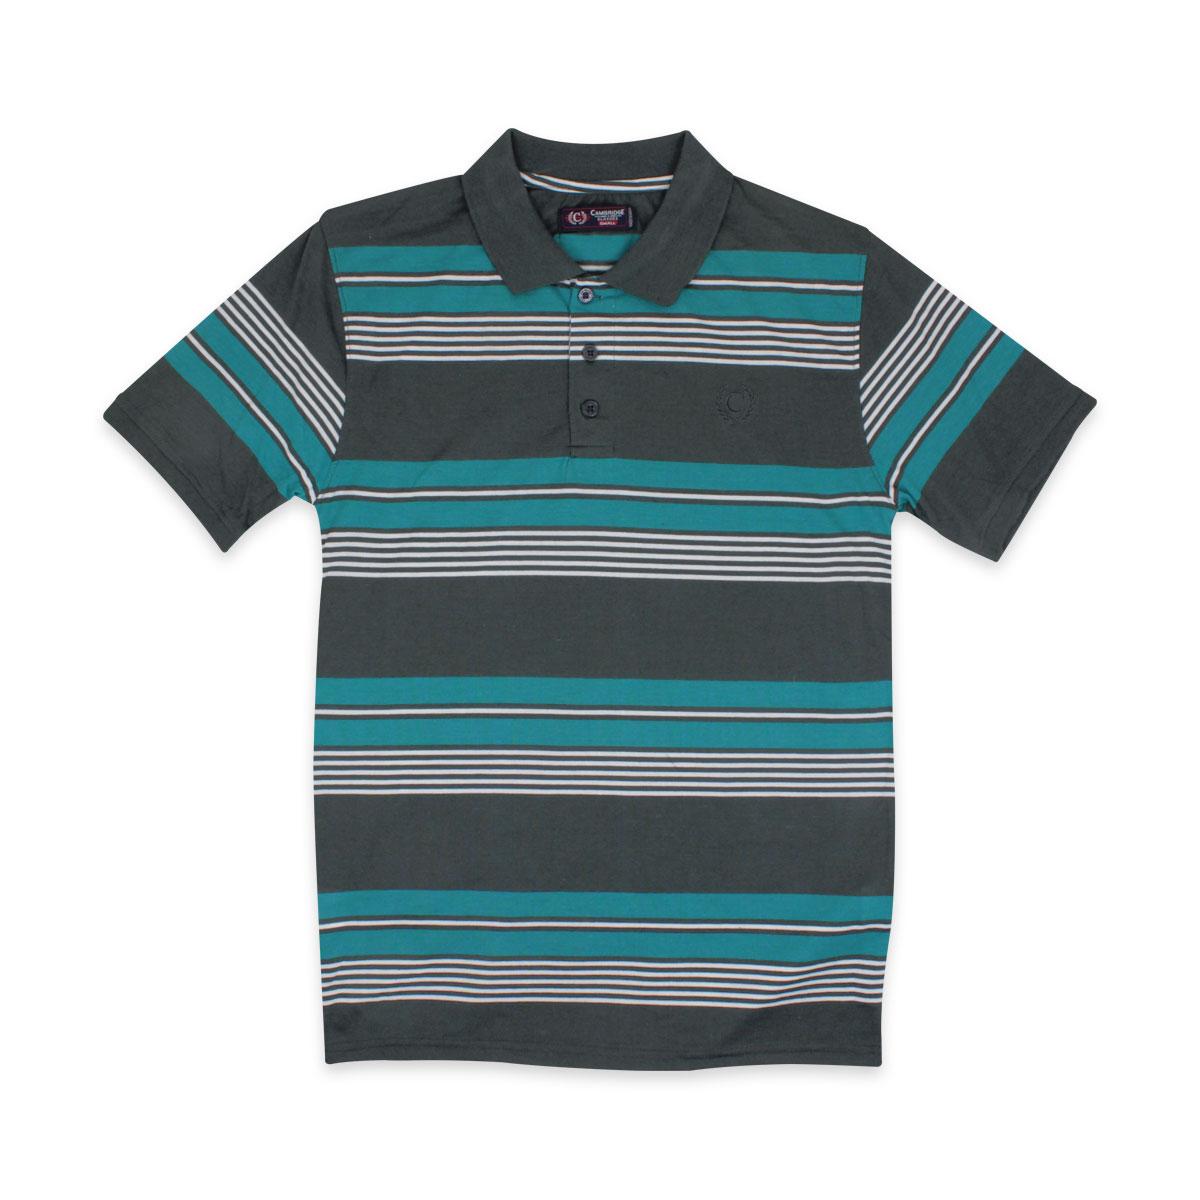 Mens Striped Polo Shirts Pique Collared T Shirt Summer Tee Short Sleeve S M L XL